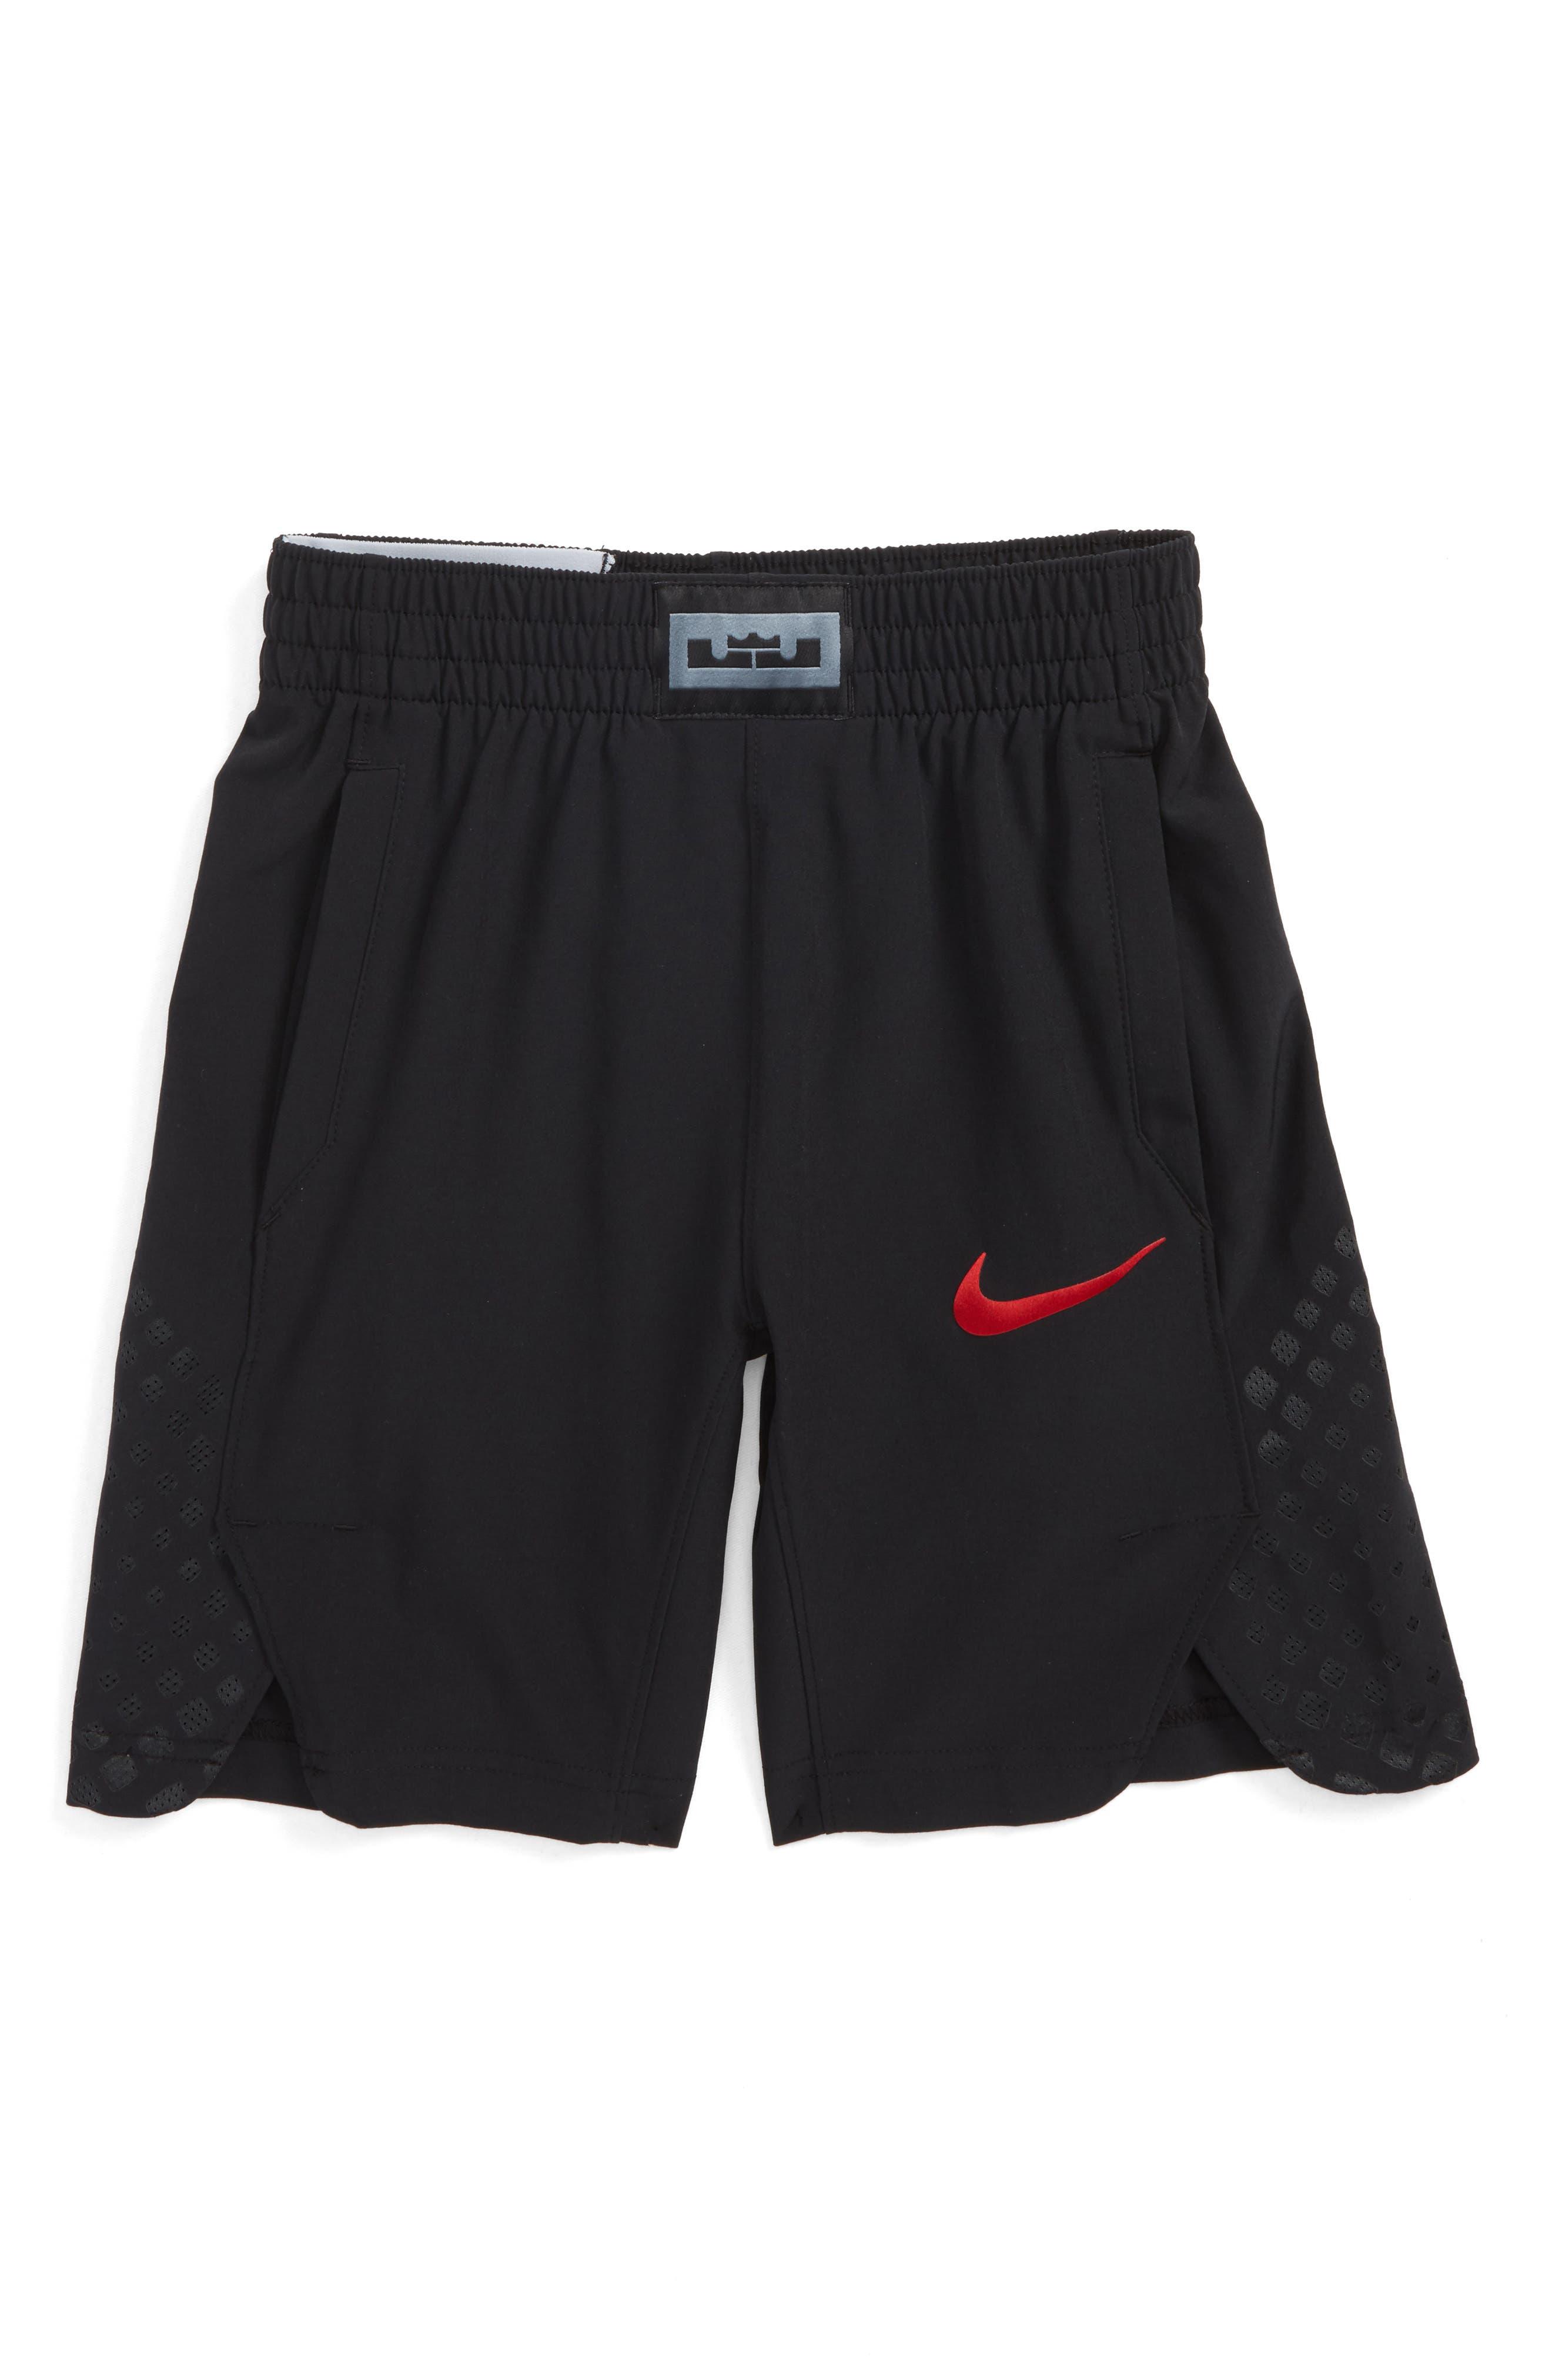 LeBron James Flex Hyper Elite Basketball Shorts,                         Main,                         color, Black/ Unvred